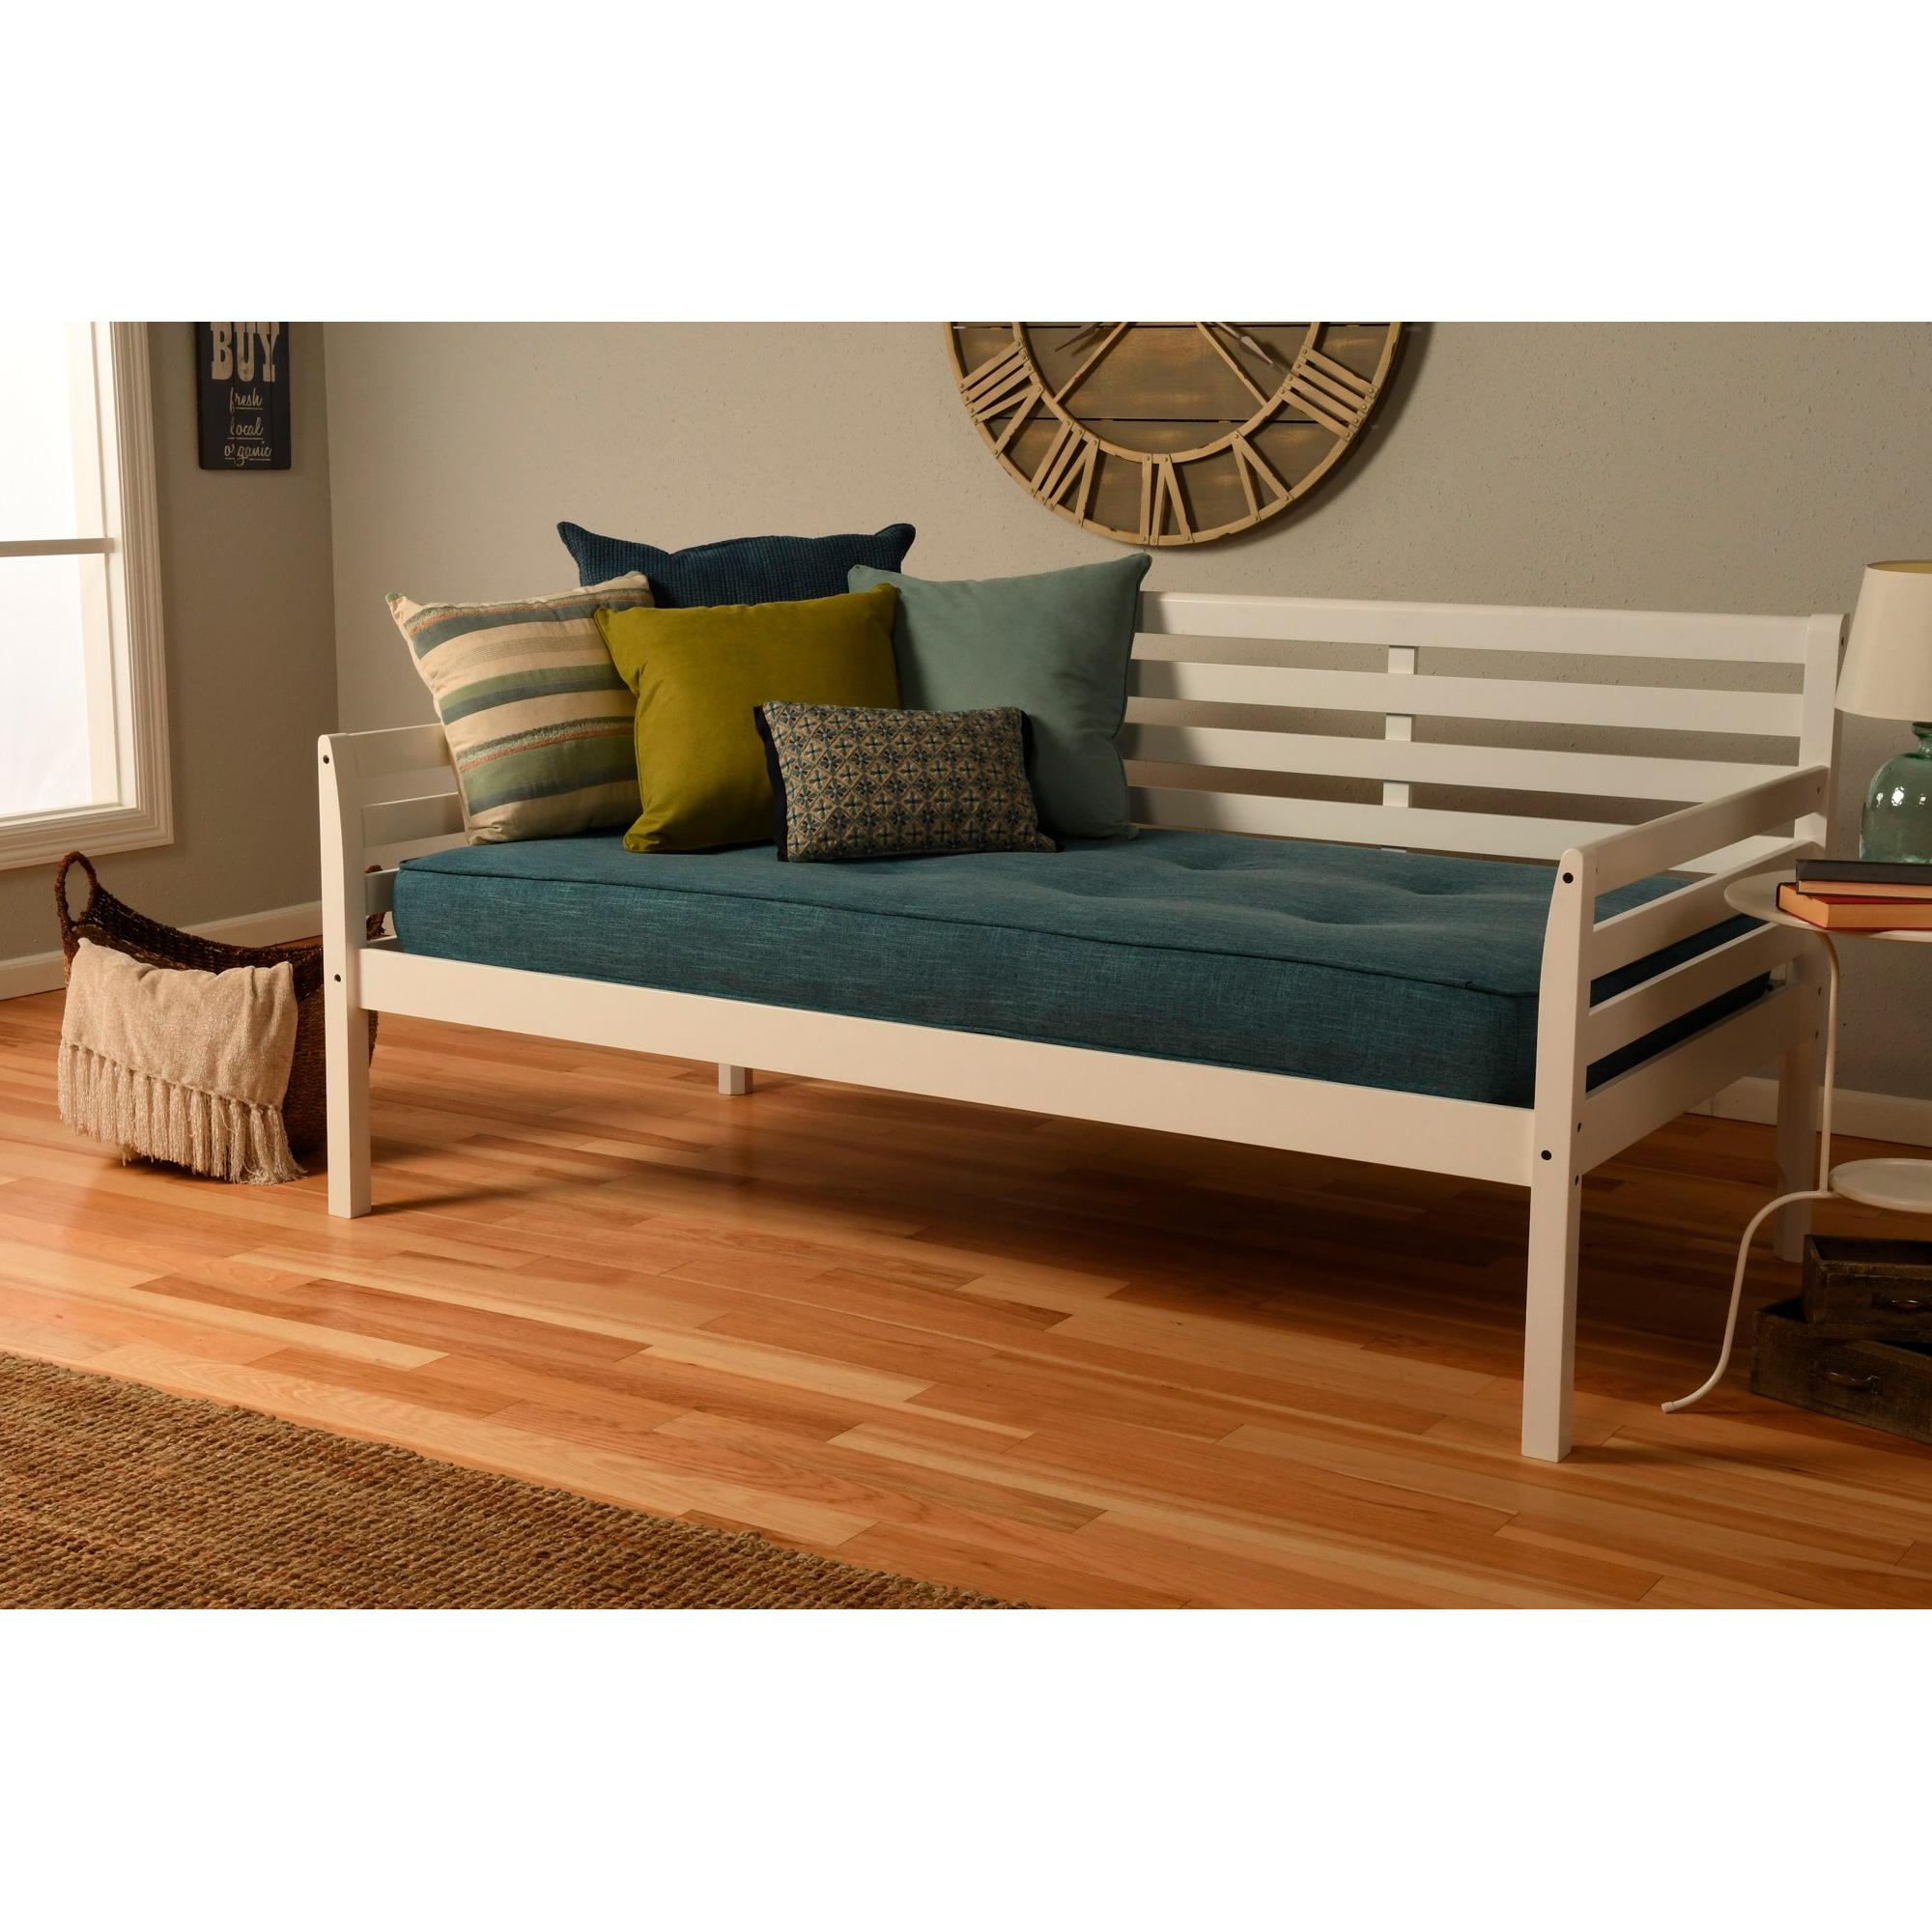 Kodiak Furniture | Boho White Daybed